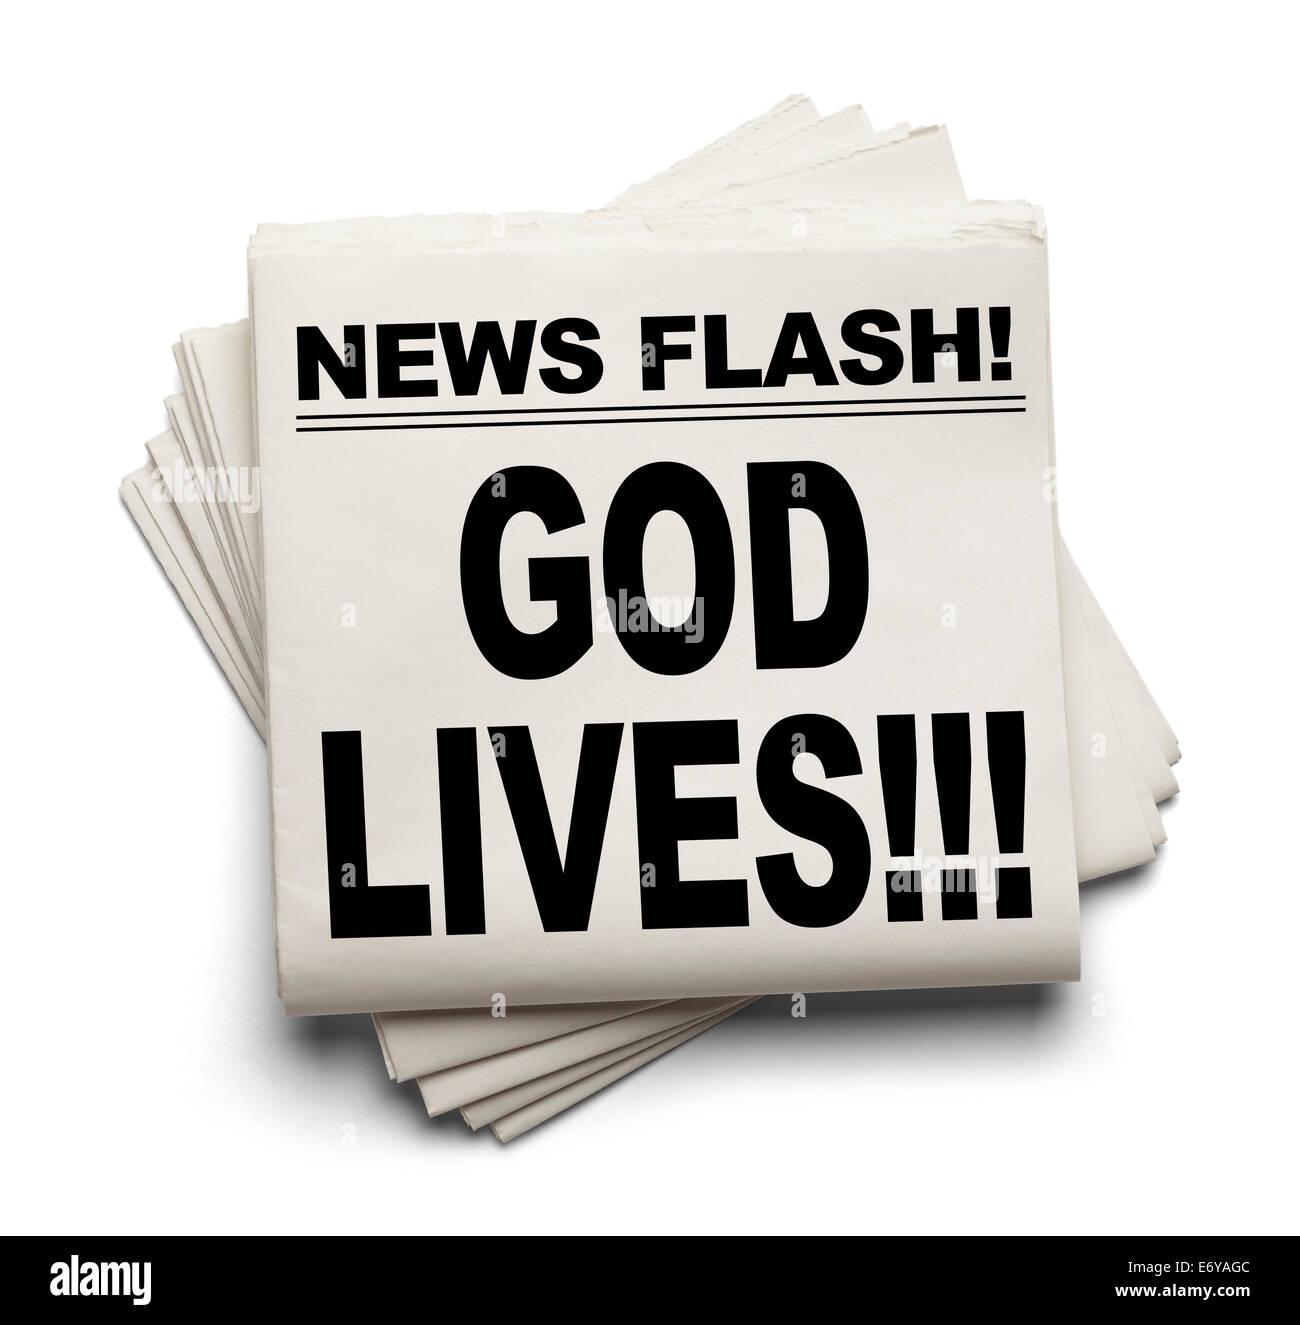 News Flash God Lives News Paper Isolated on White Background. - Stock Image